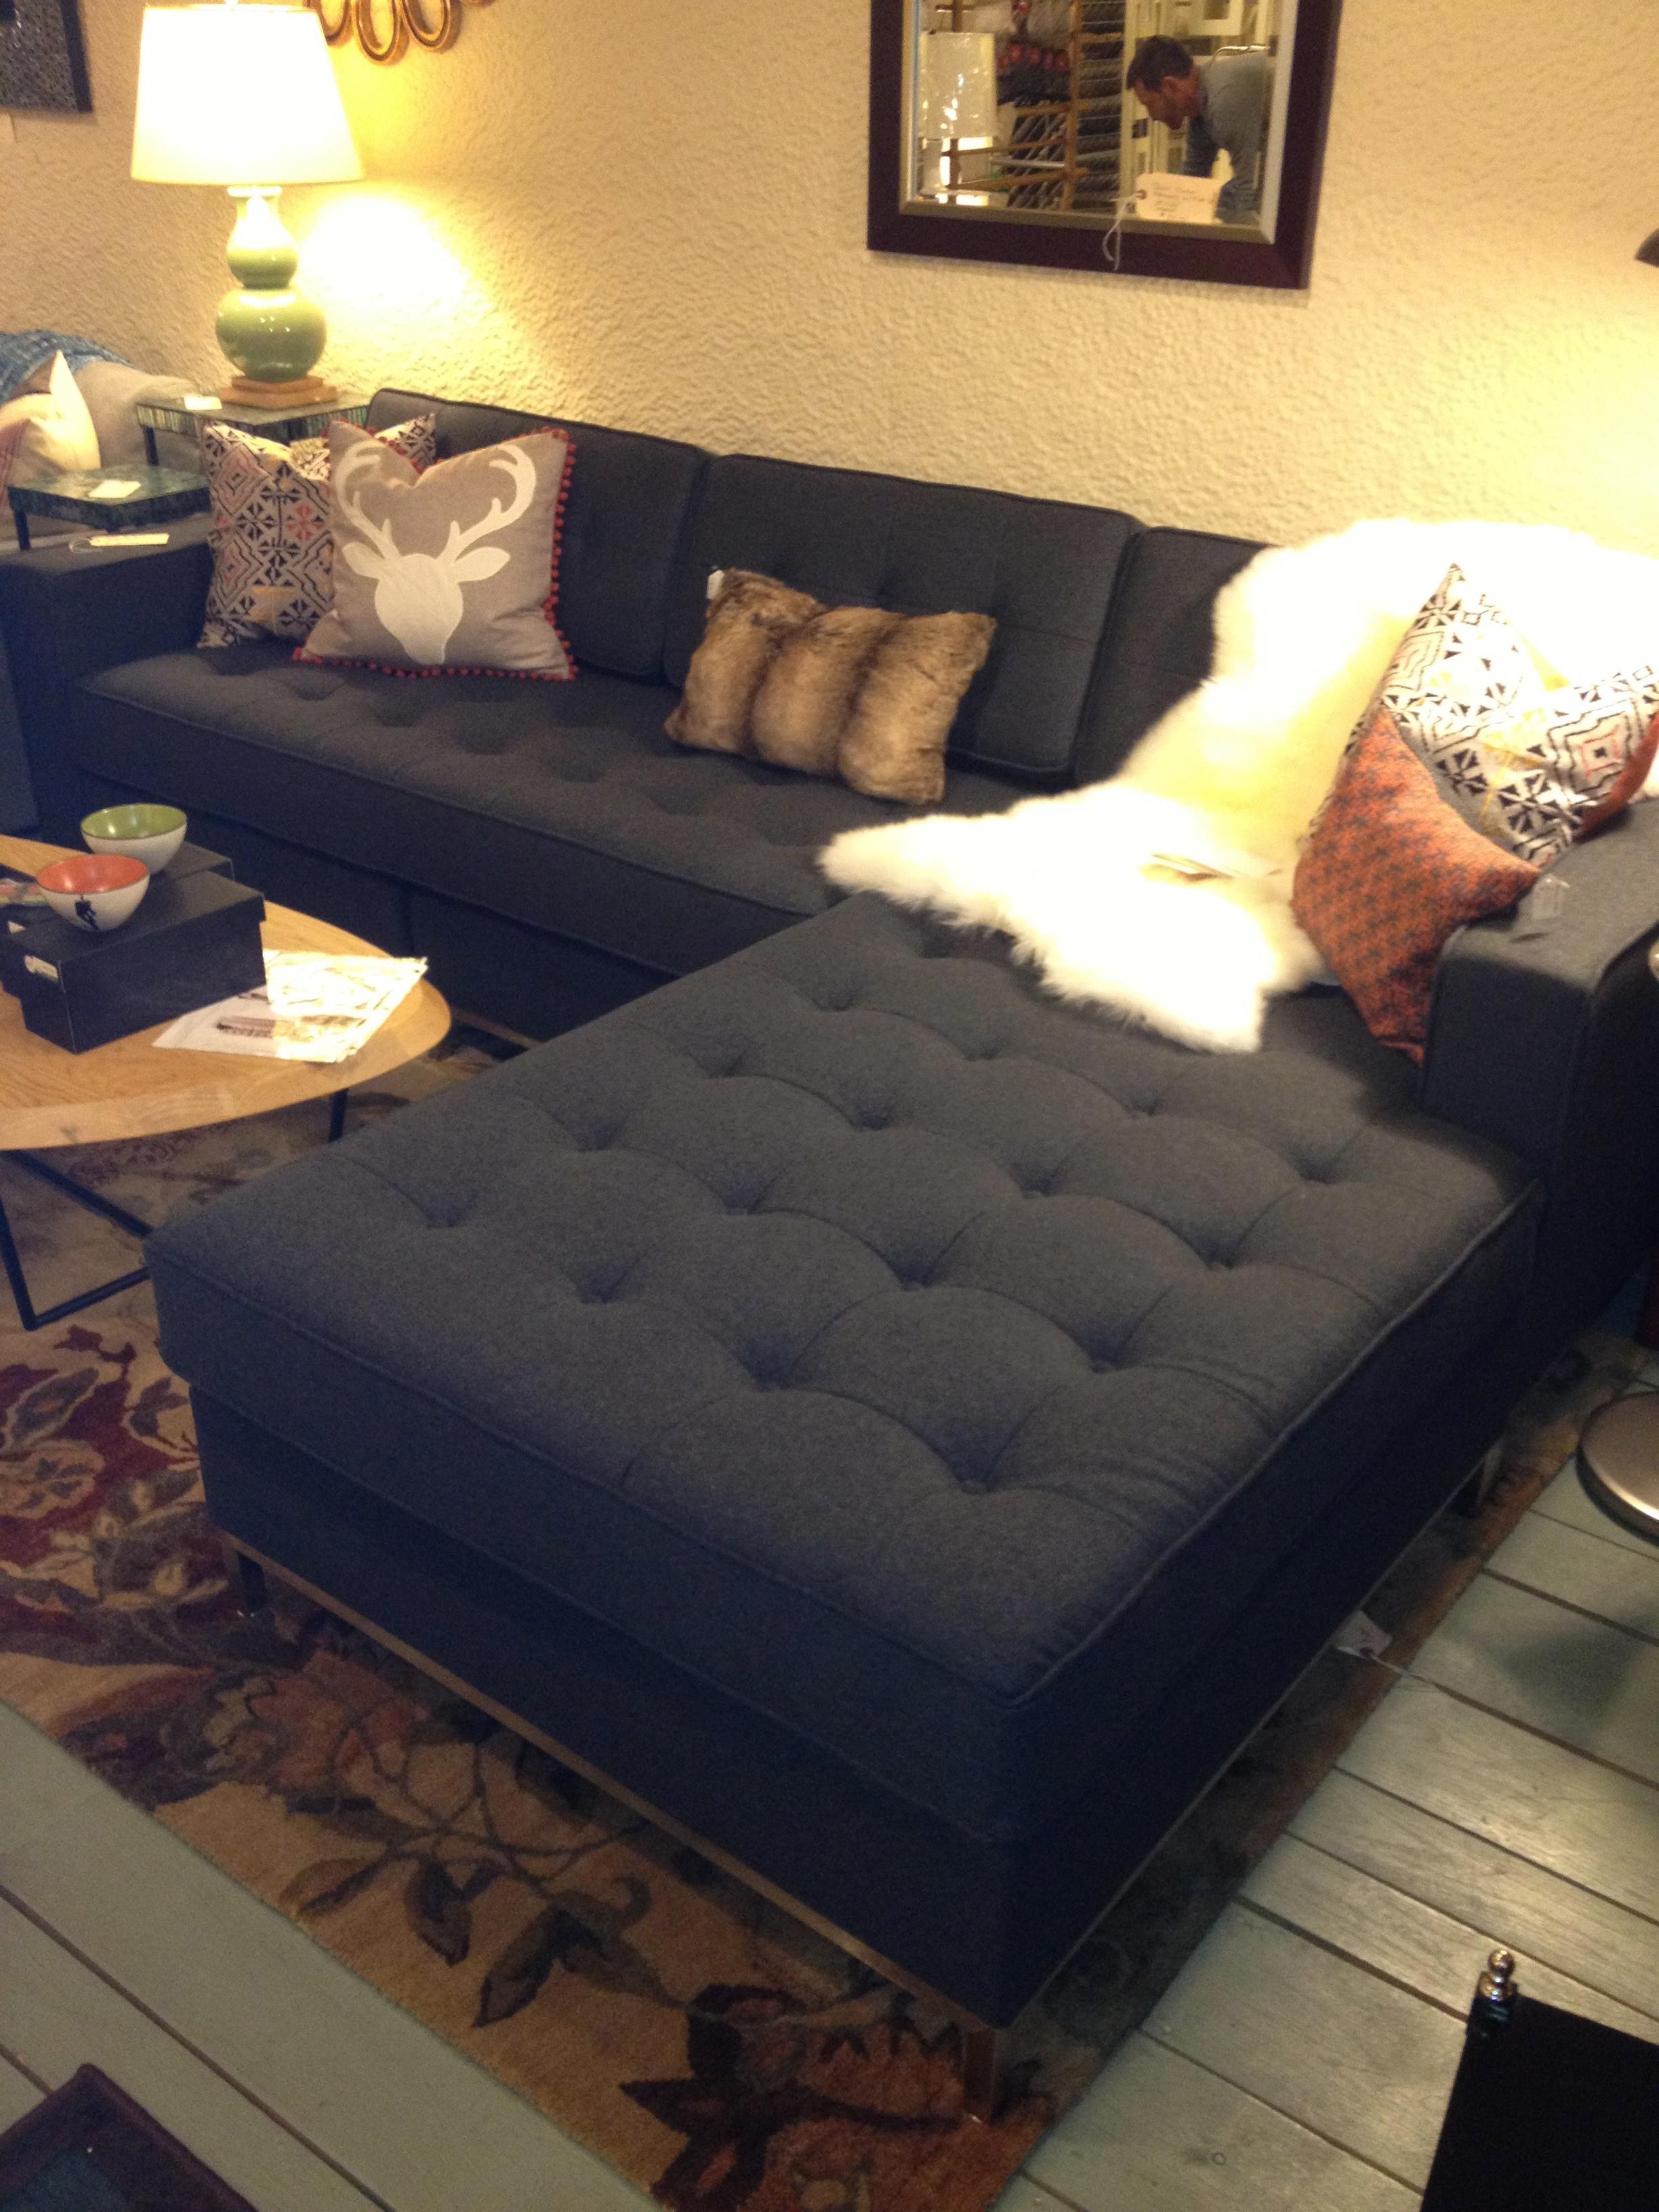 Jane Bi Sectional Sofa - Leather Sectional Sofa pertaining to Jane Bi Sectional Sofa